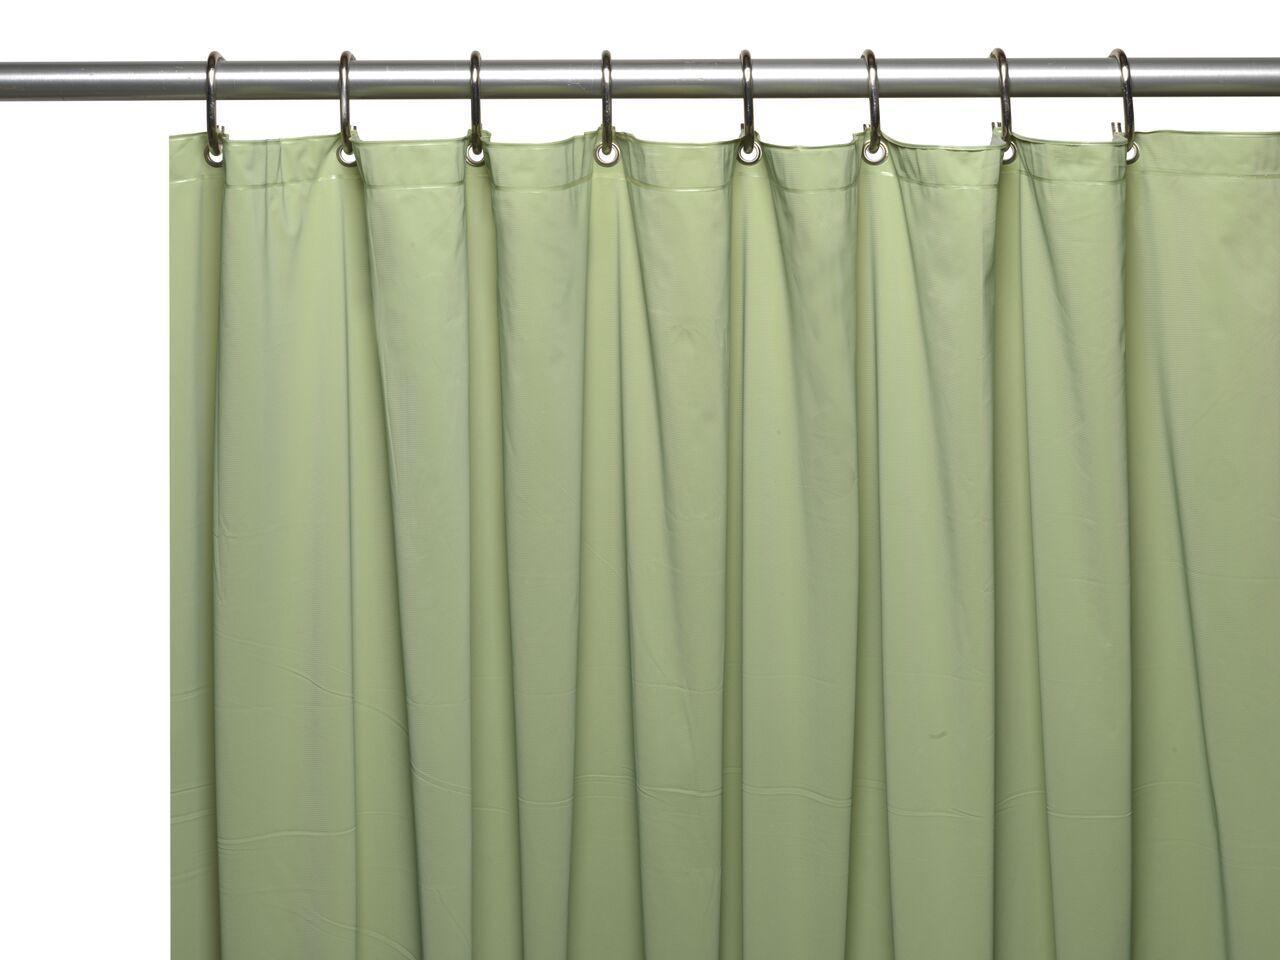 Sage Green 3 Gauge Vinyl Shower Curtain Liner With Metal Grommets